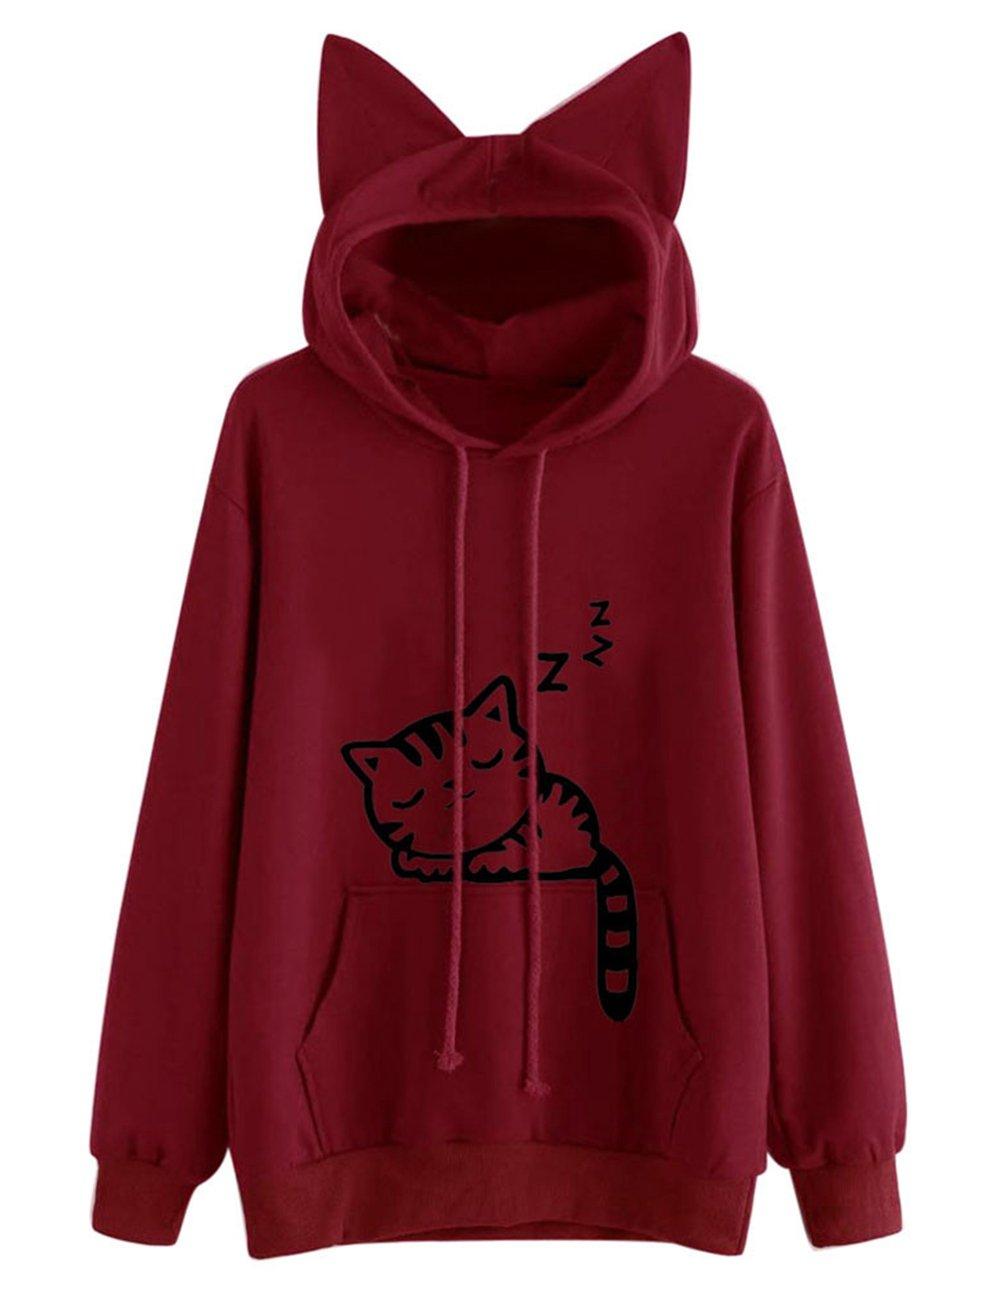 KEYEE Cute Cat Sweatshirt, Women Teen Girls Cotton Hoodie Sweater Pullover Tops with Pocket (XL, Red)